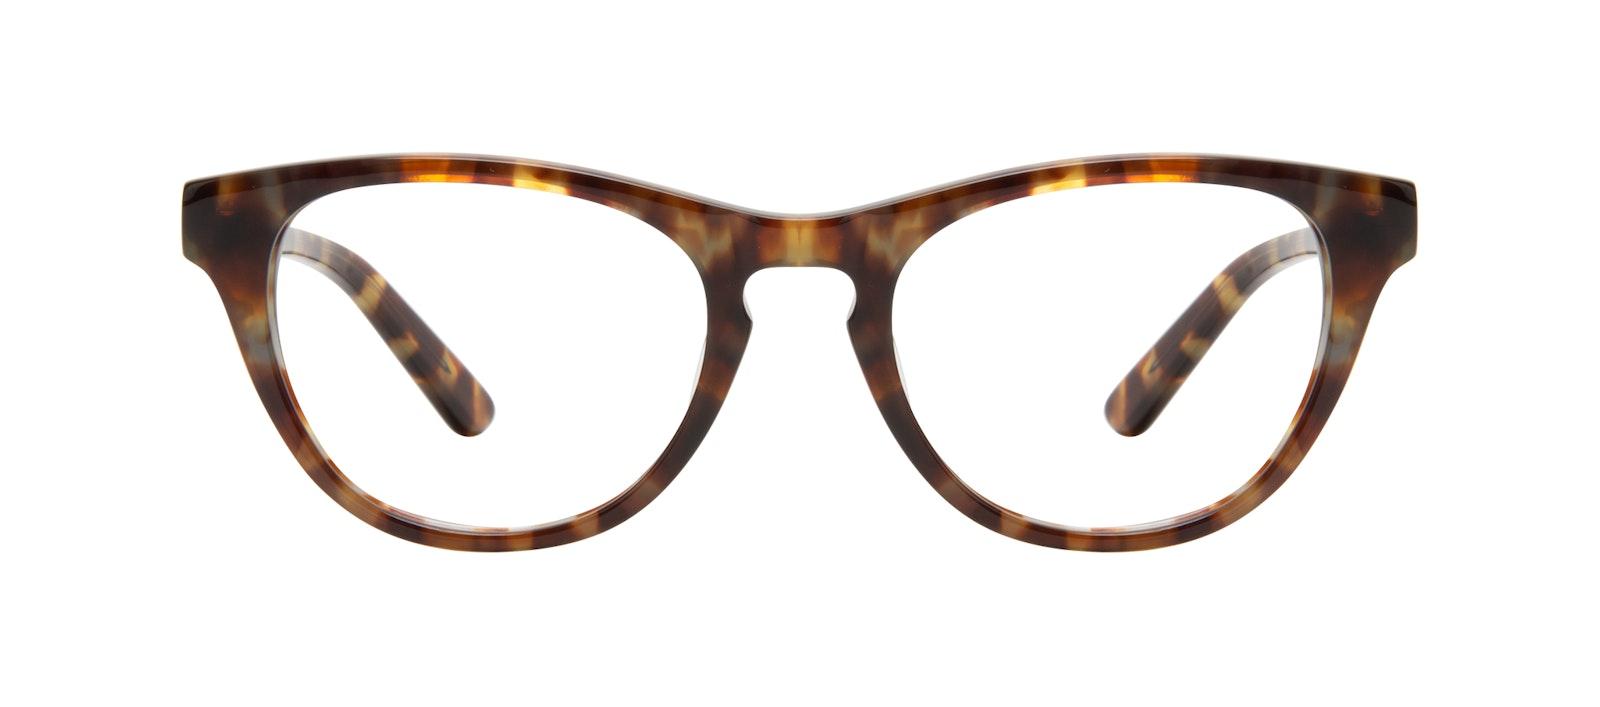 Affordable Fashion Glasses Cat Eye Eyeglasses Women Selfie Tortoise Front